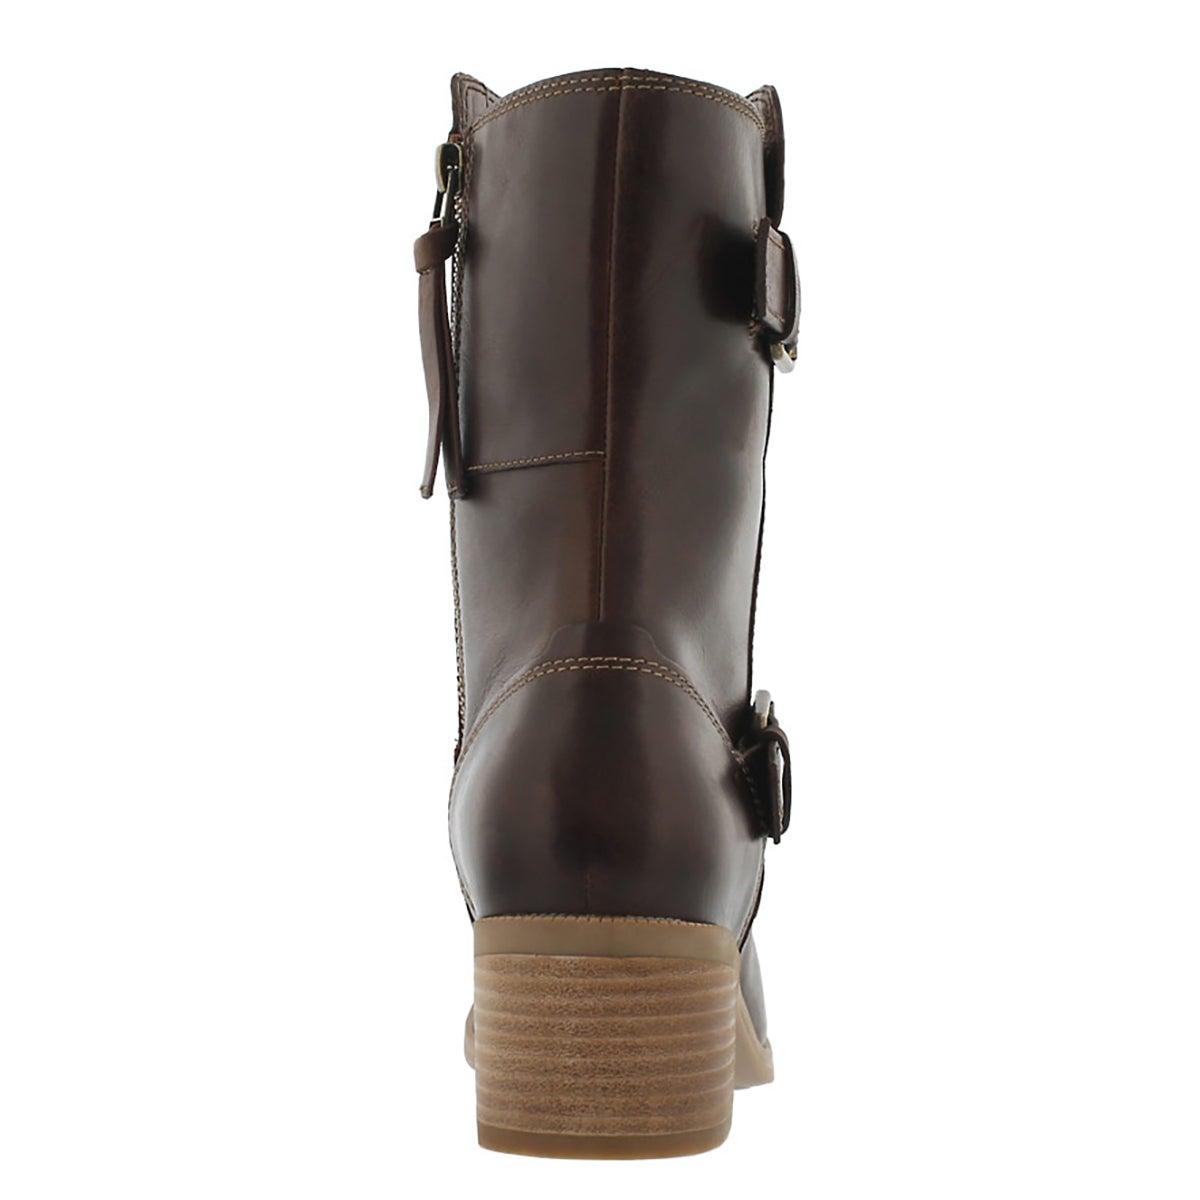 Lds Maypearl Oasis dk tan mid-calf boot